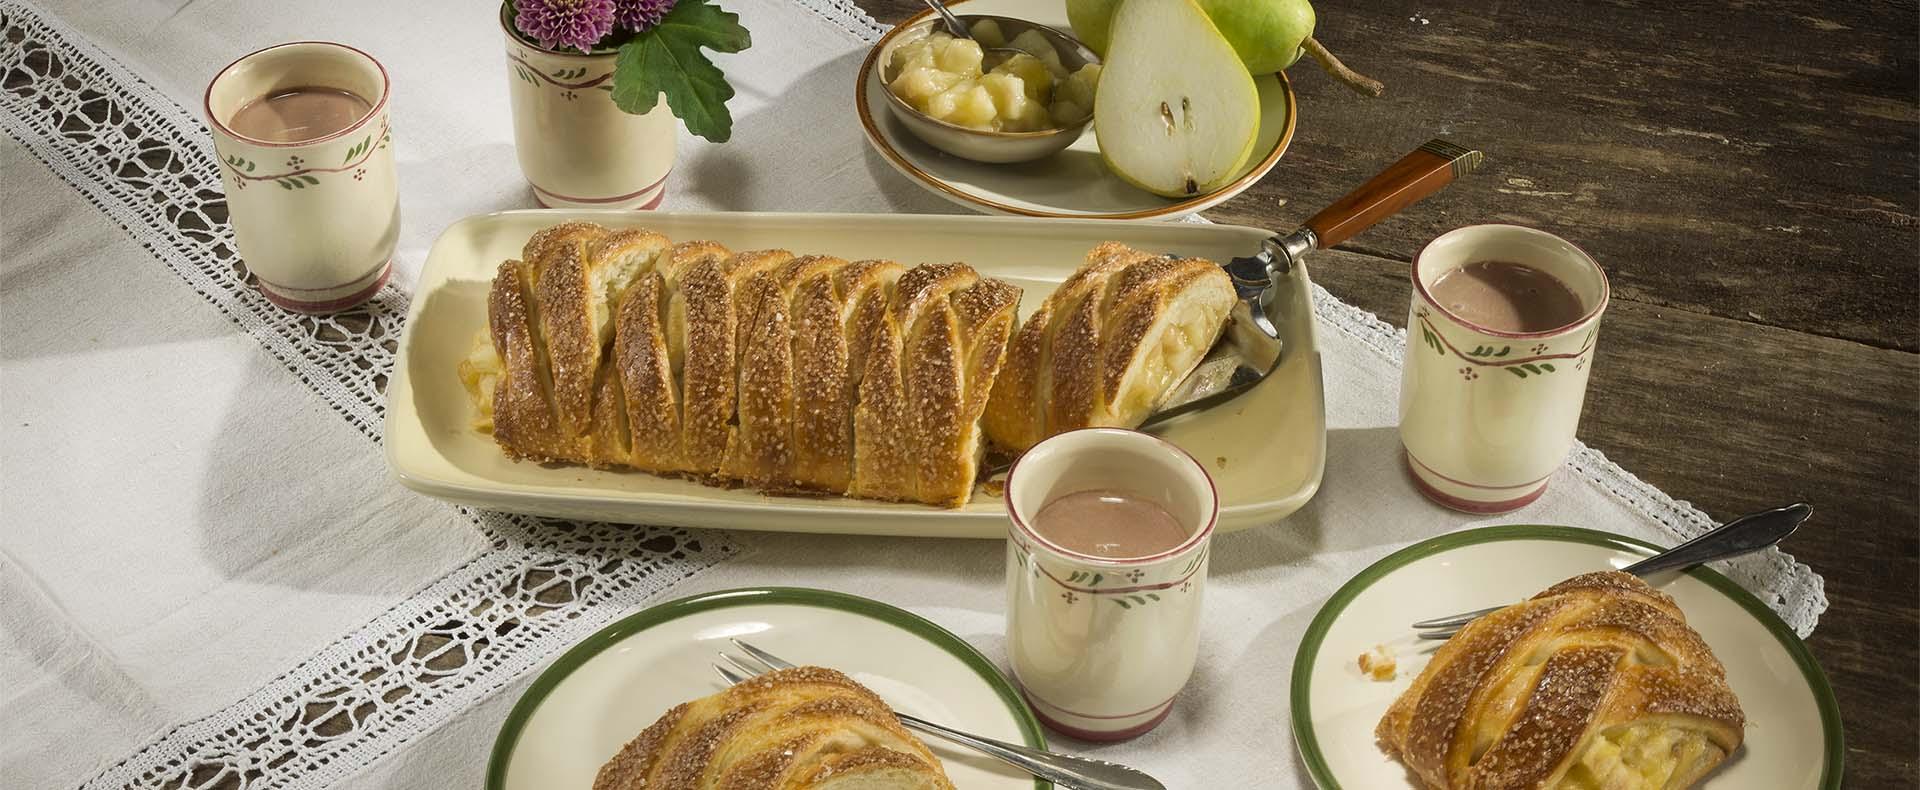 Rezept Flechtzopf mit Birne und Mandeln Tante Fanny